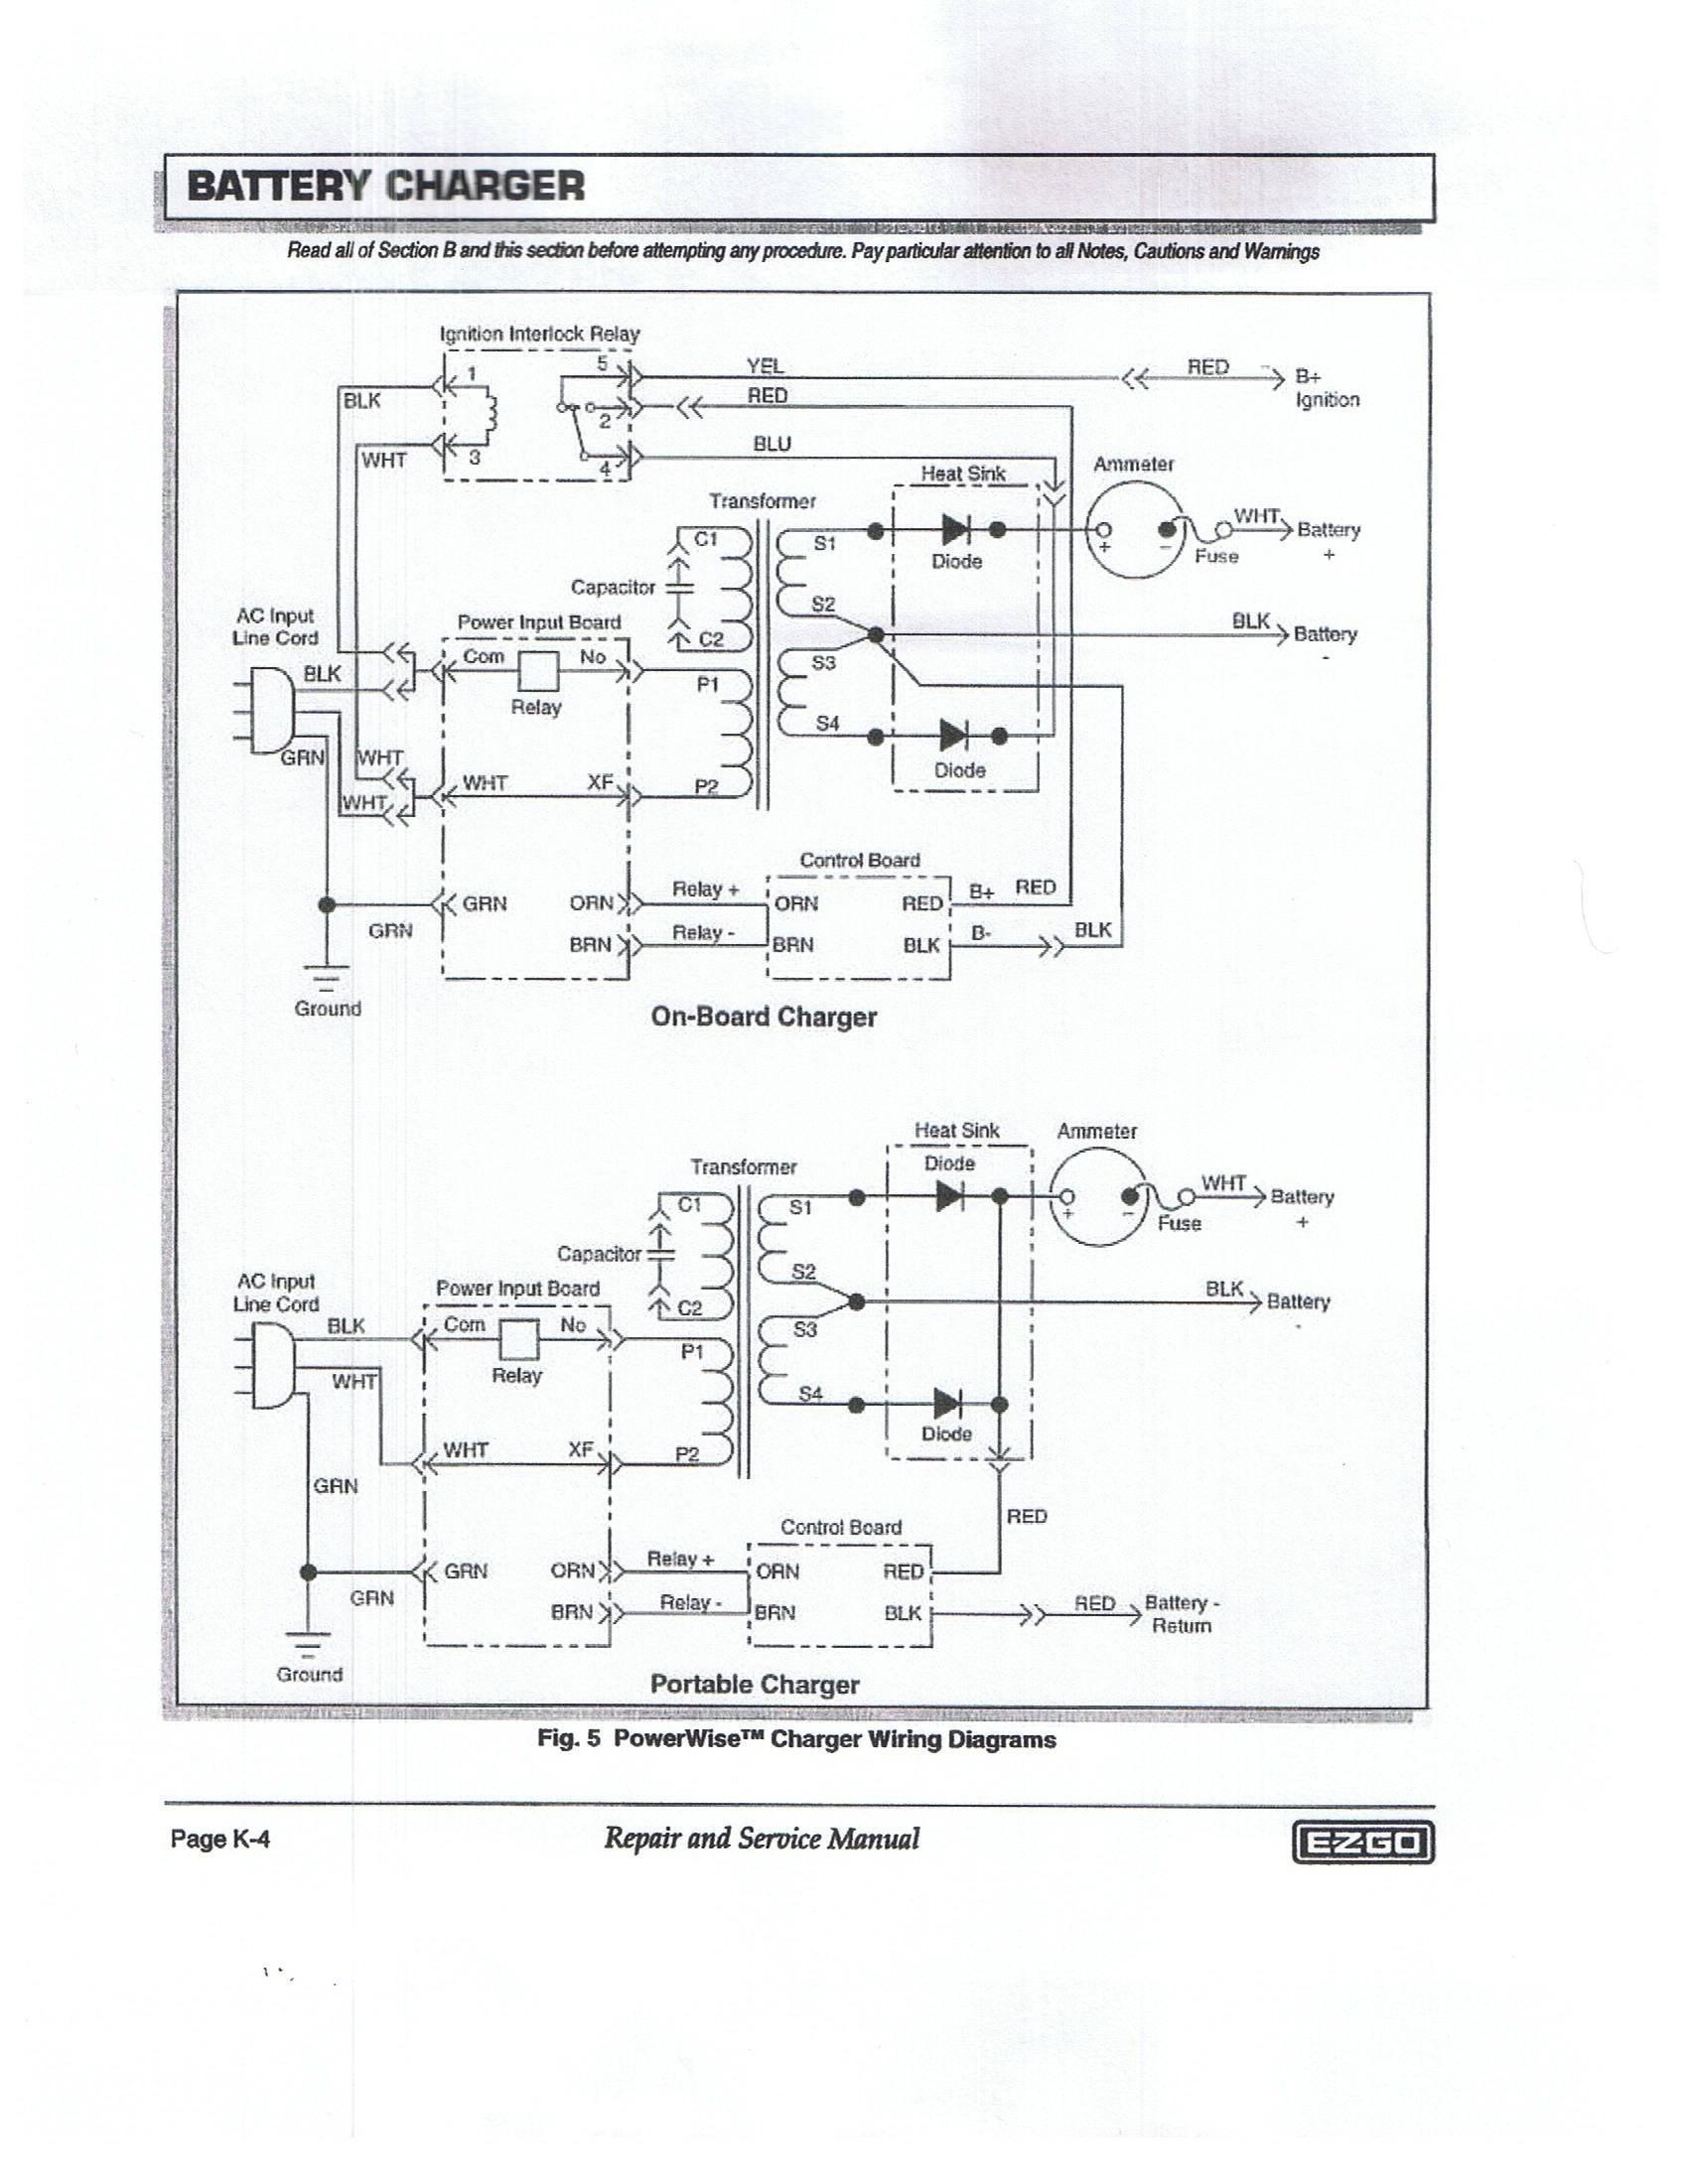 48 Volt Star Golf Cart Wiring Diagram | Wiring Library - Club Car Wiring Diagram 48 Volt